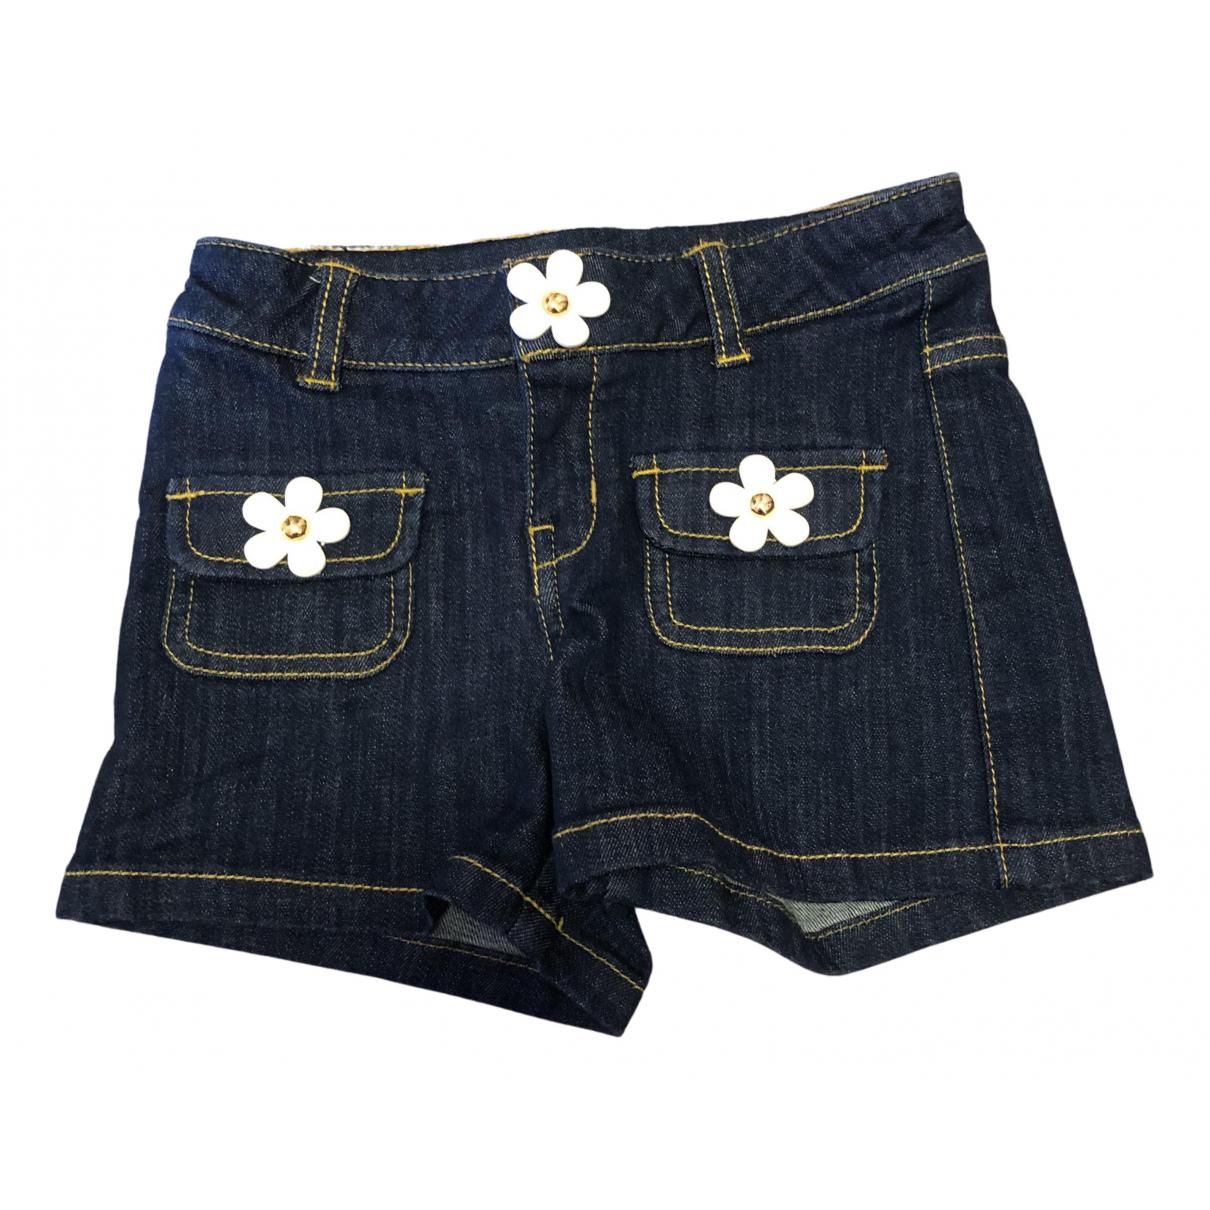 Pantalon corto Little Marc Jacobs